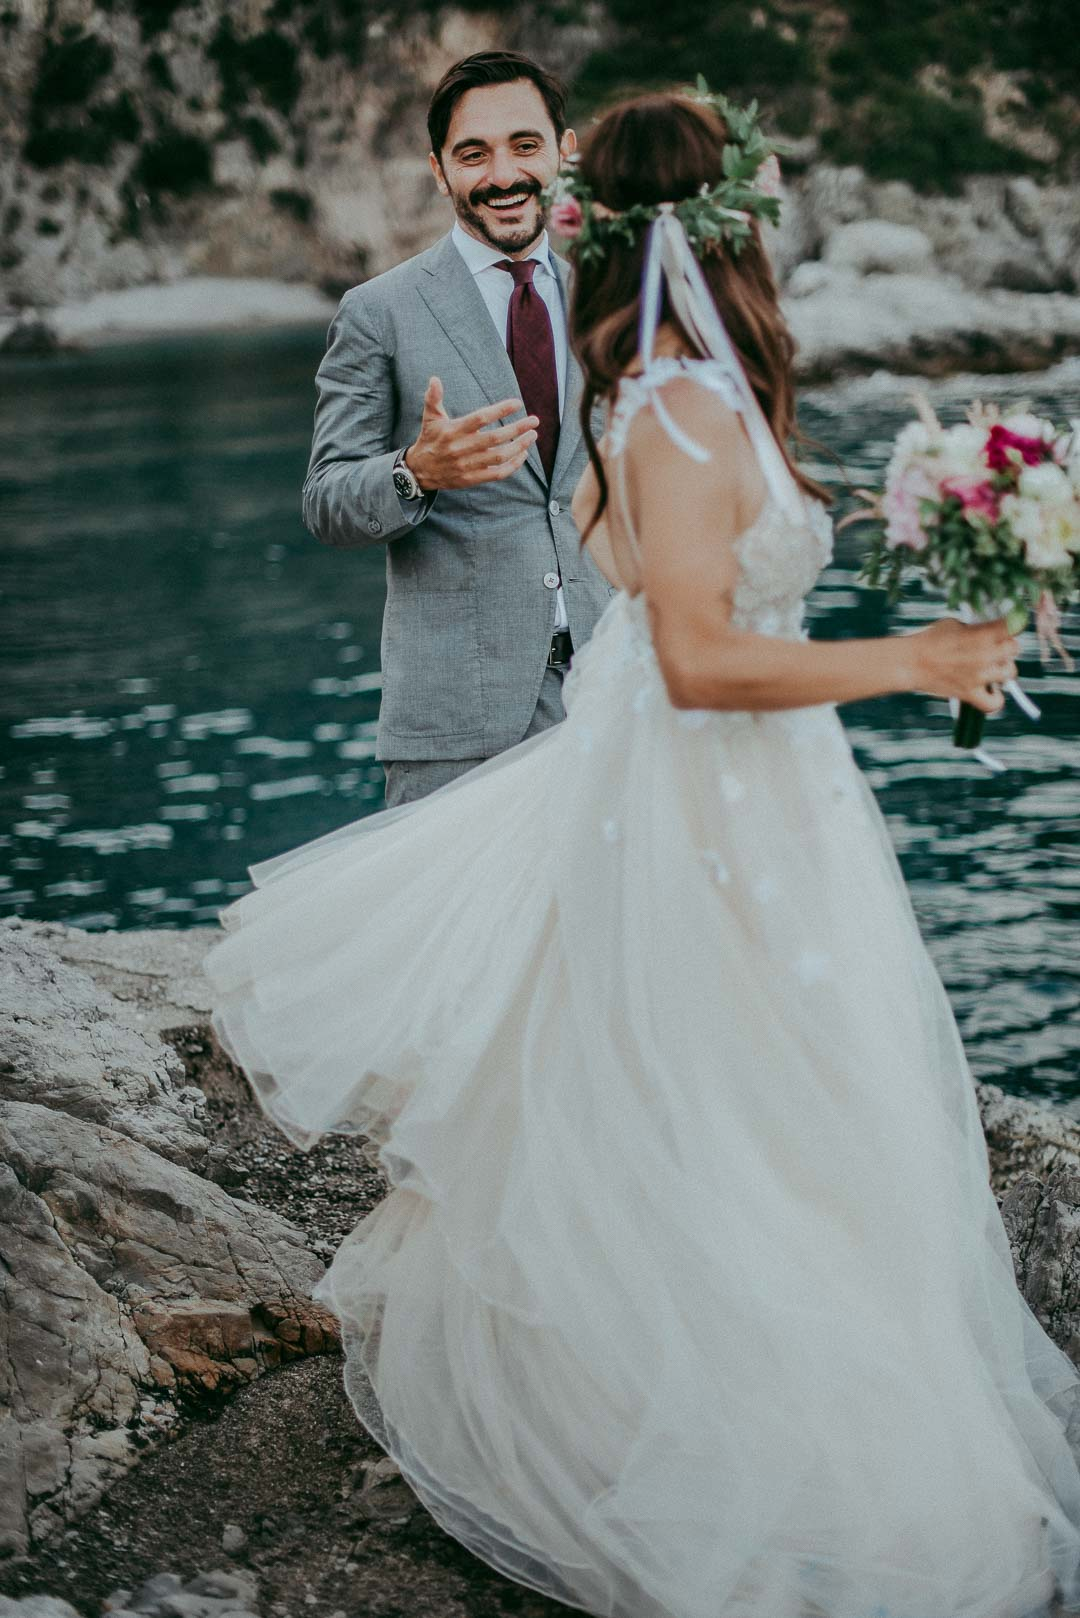 wedding-photographer-destination-fineart-bespoke-reportage-amalficoast-torrelacerniola-vivianeizzo-spazio46-73